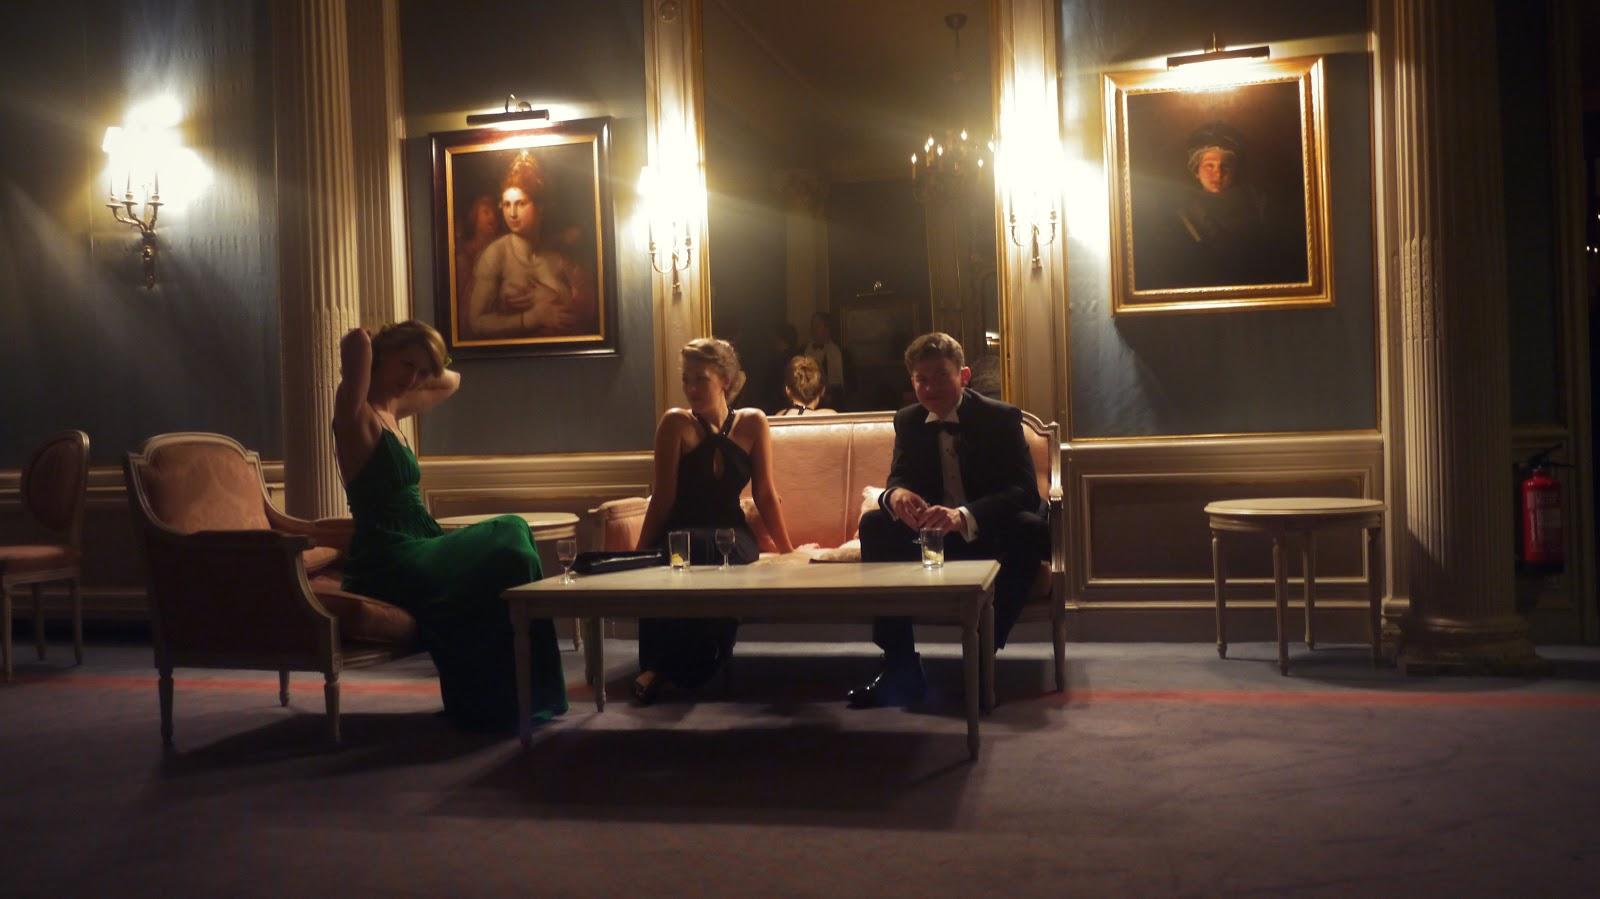 Savile Club Christmas Ball  LUX LIFE LONDON  A Luxury